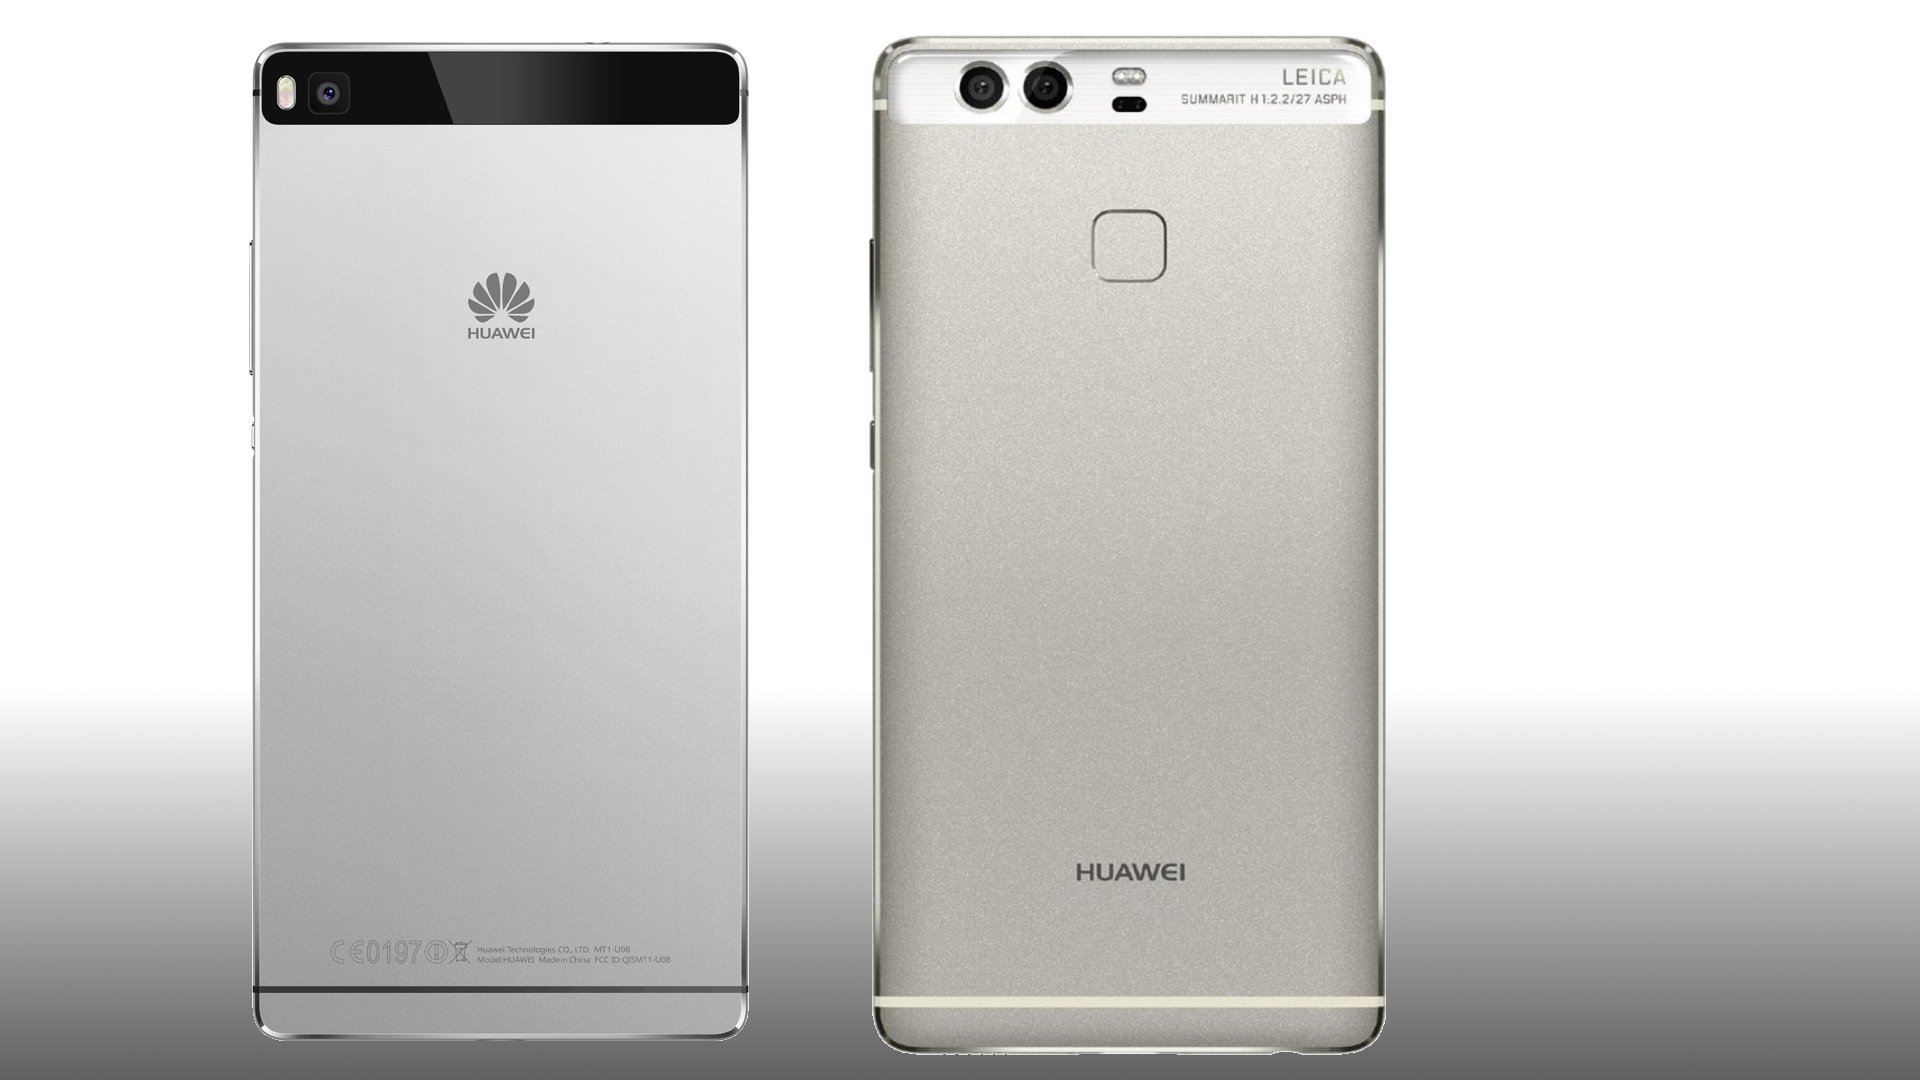 Huawei p9 vs huawei p8 comparaci n del mismo dise o al for Huawei p8 te koop